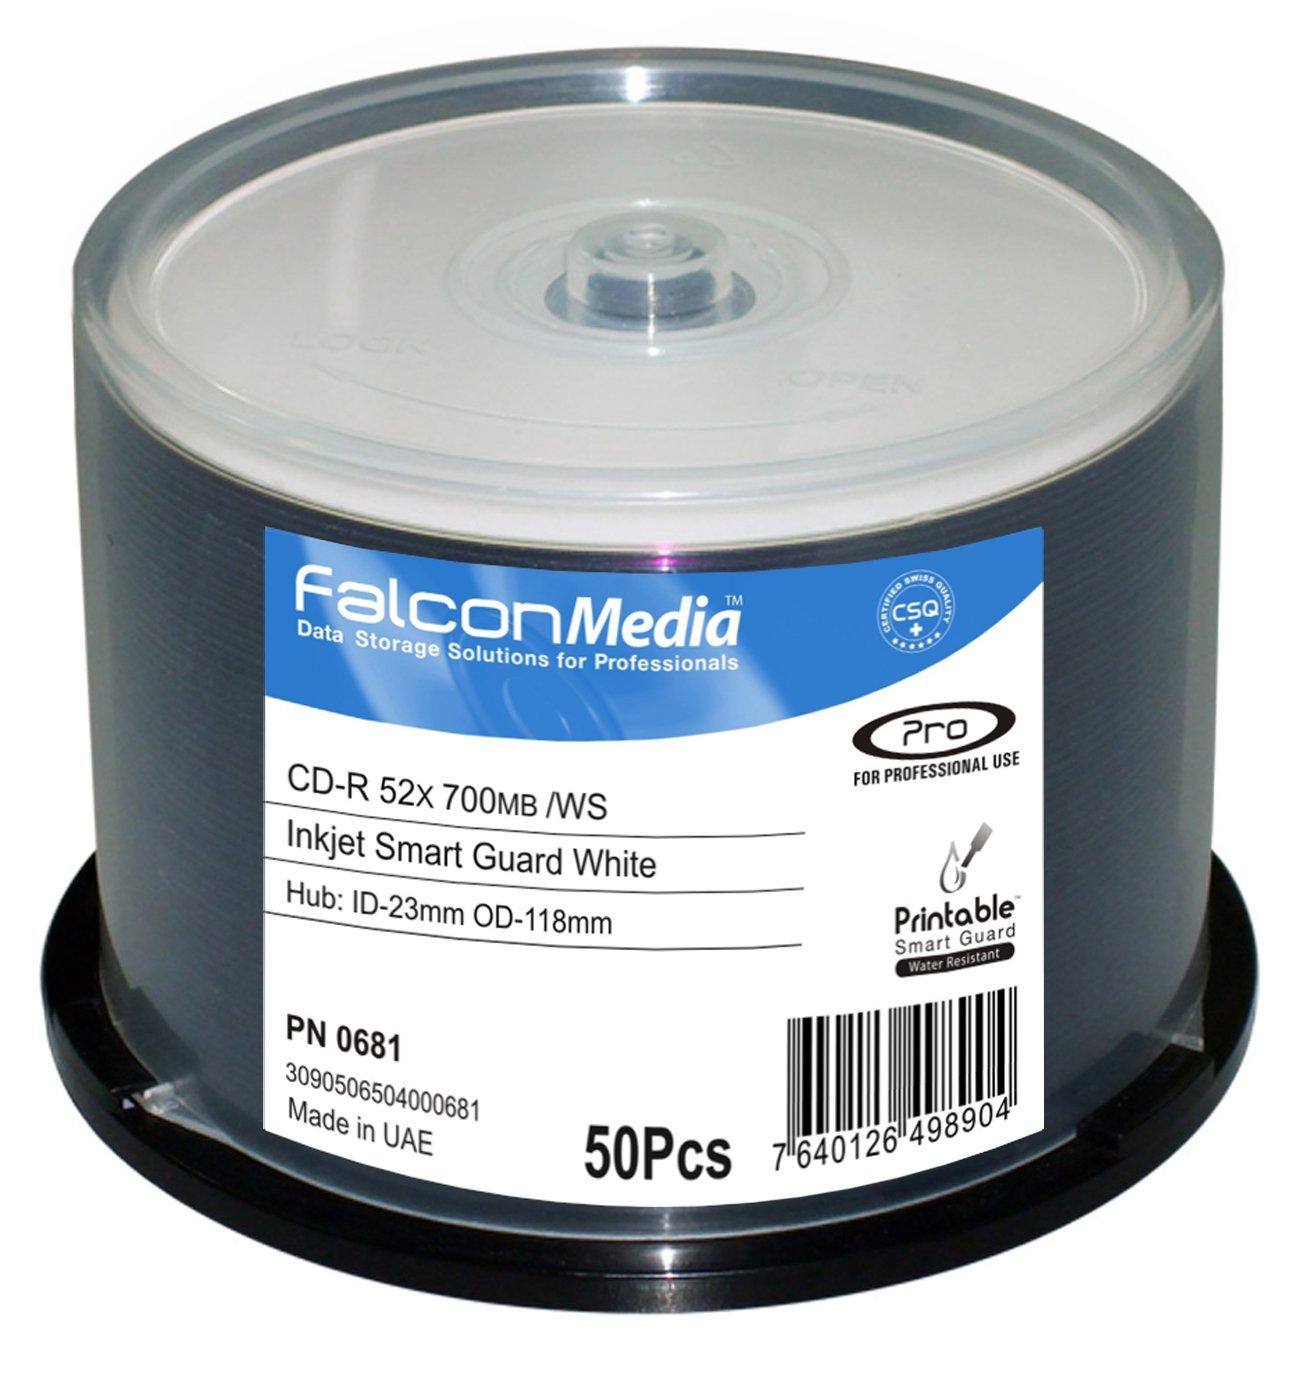 FalconMedia SmartGuard Glossy White Inkjet CD-R - 52x, 700mb/80 Minute, Hub-Printable, Water Resistant - 50 Pack by FalconMedia